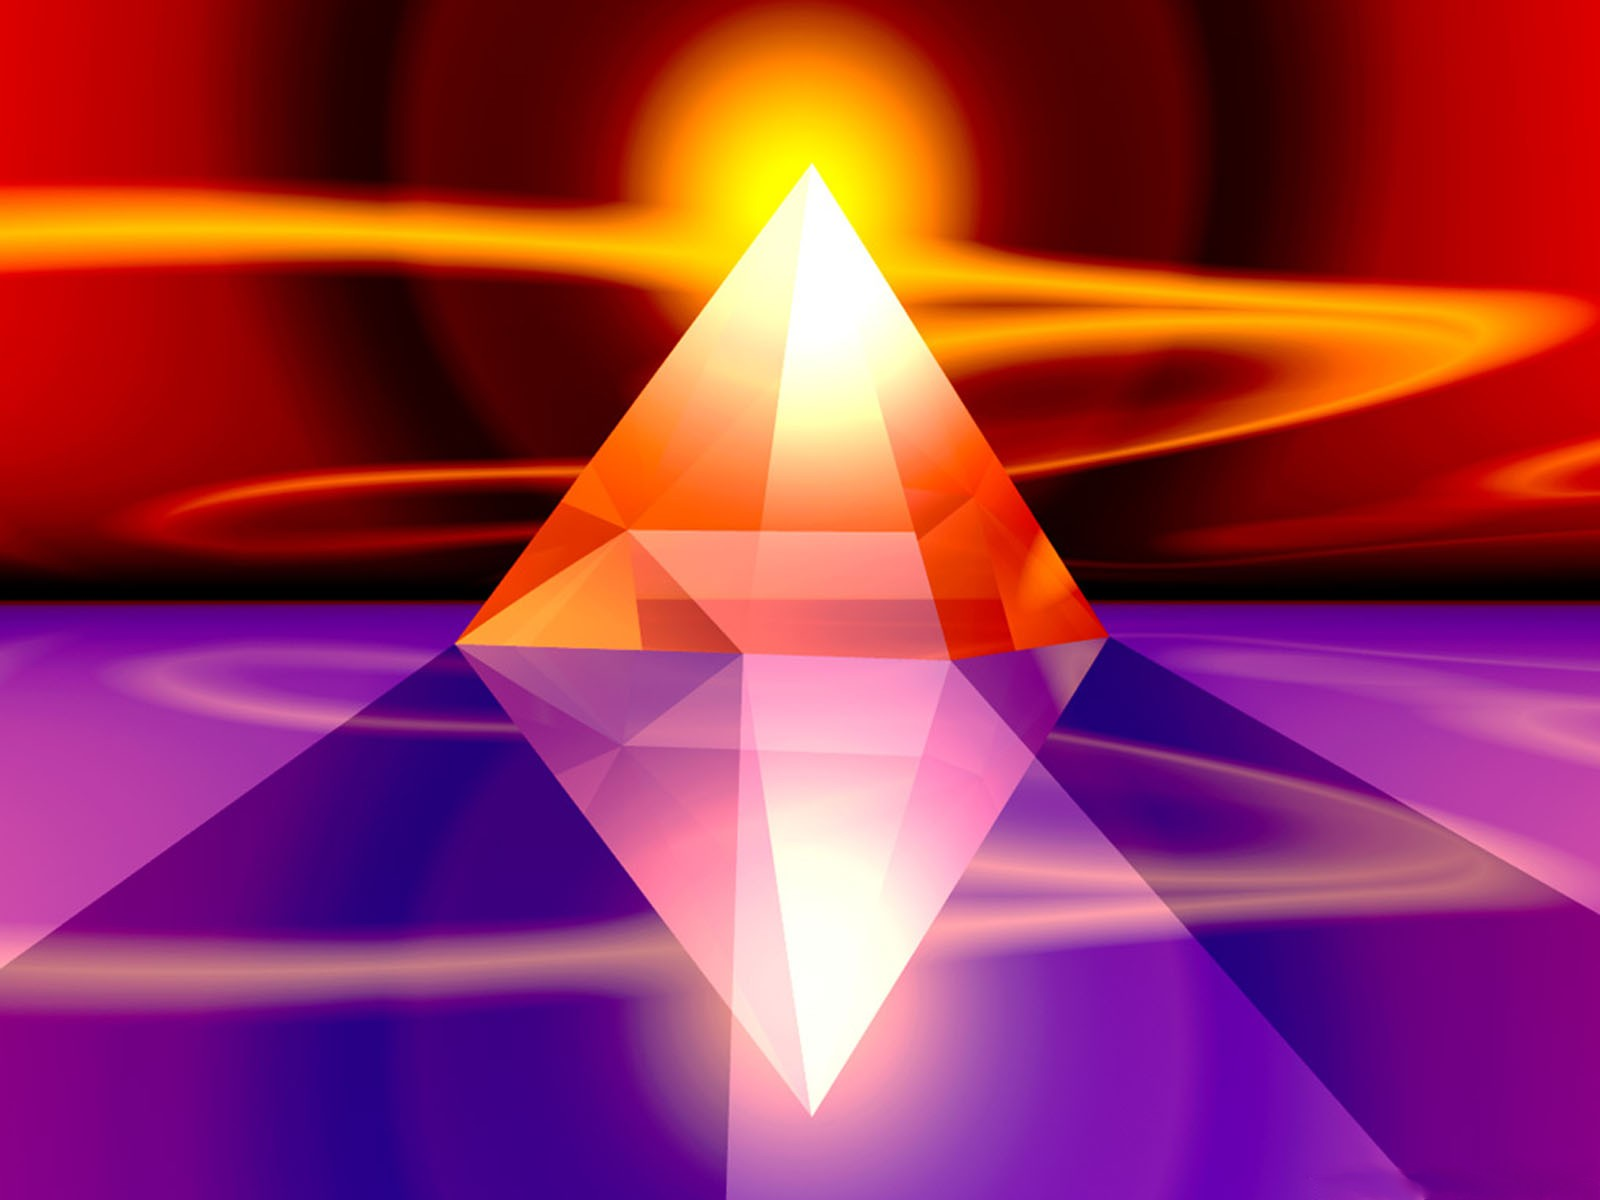 Crystal_Sun_Pyramid